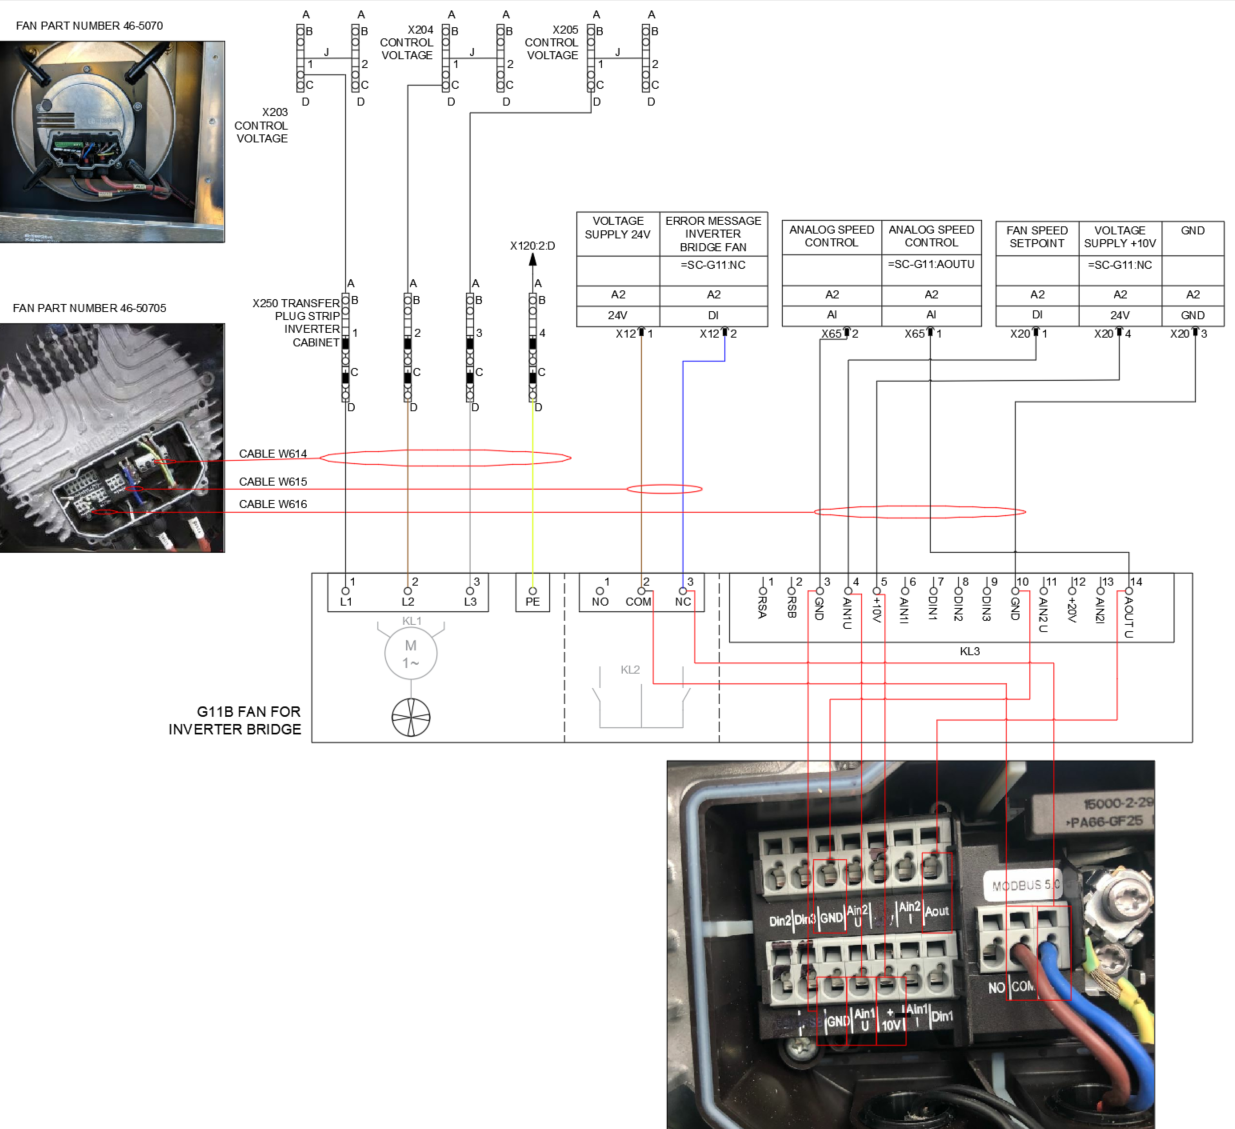 Sunny Boy Inverter Wiring Diagram from s3.amazonaws.com